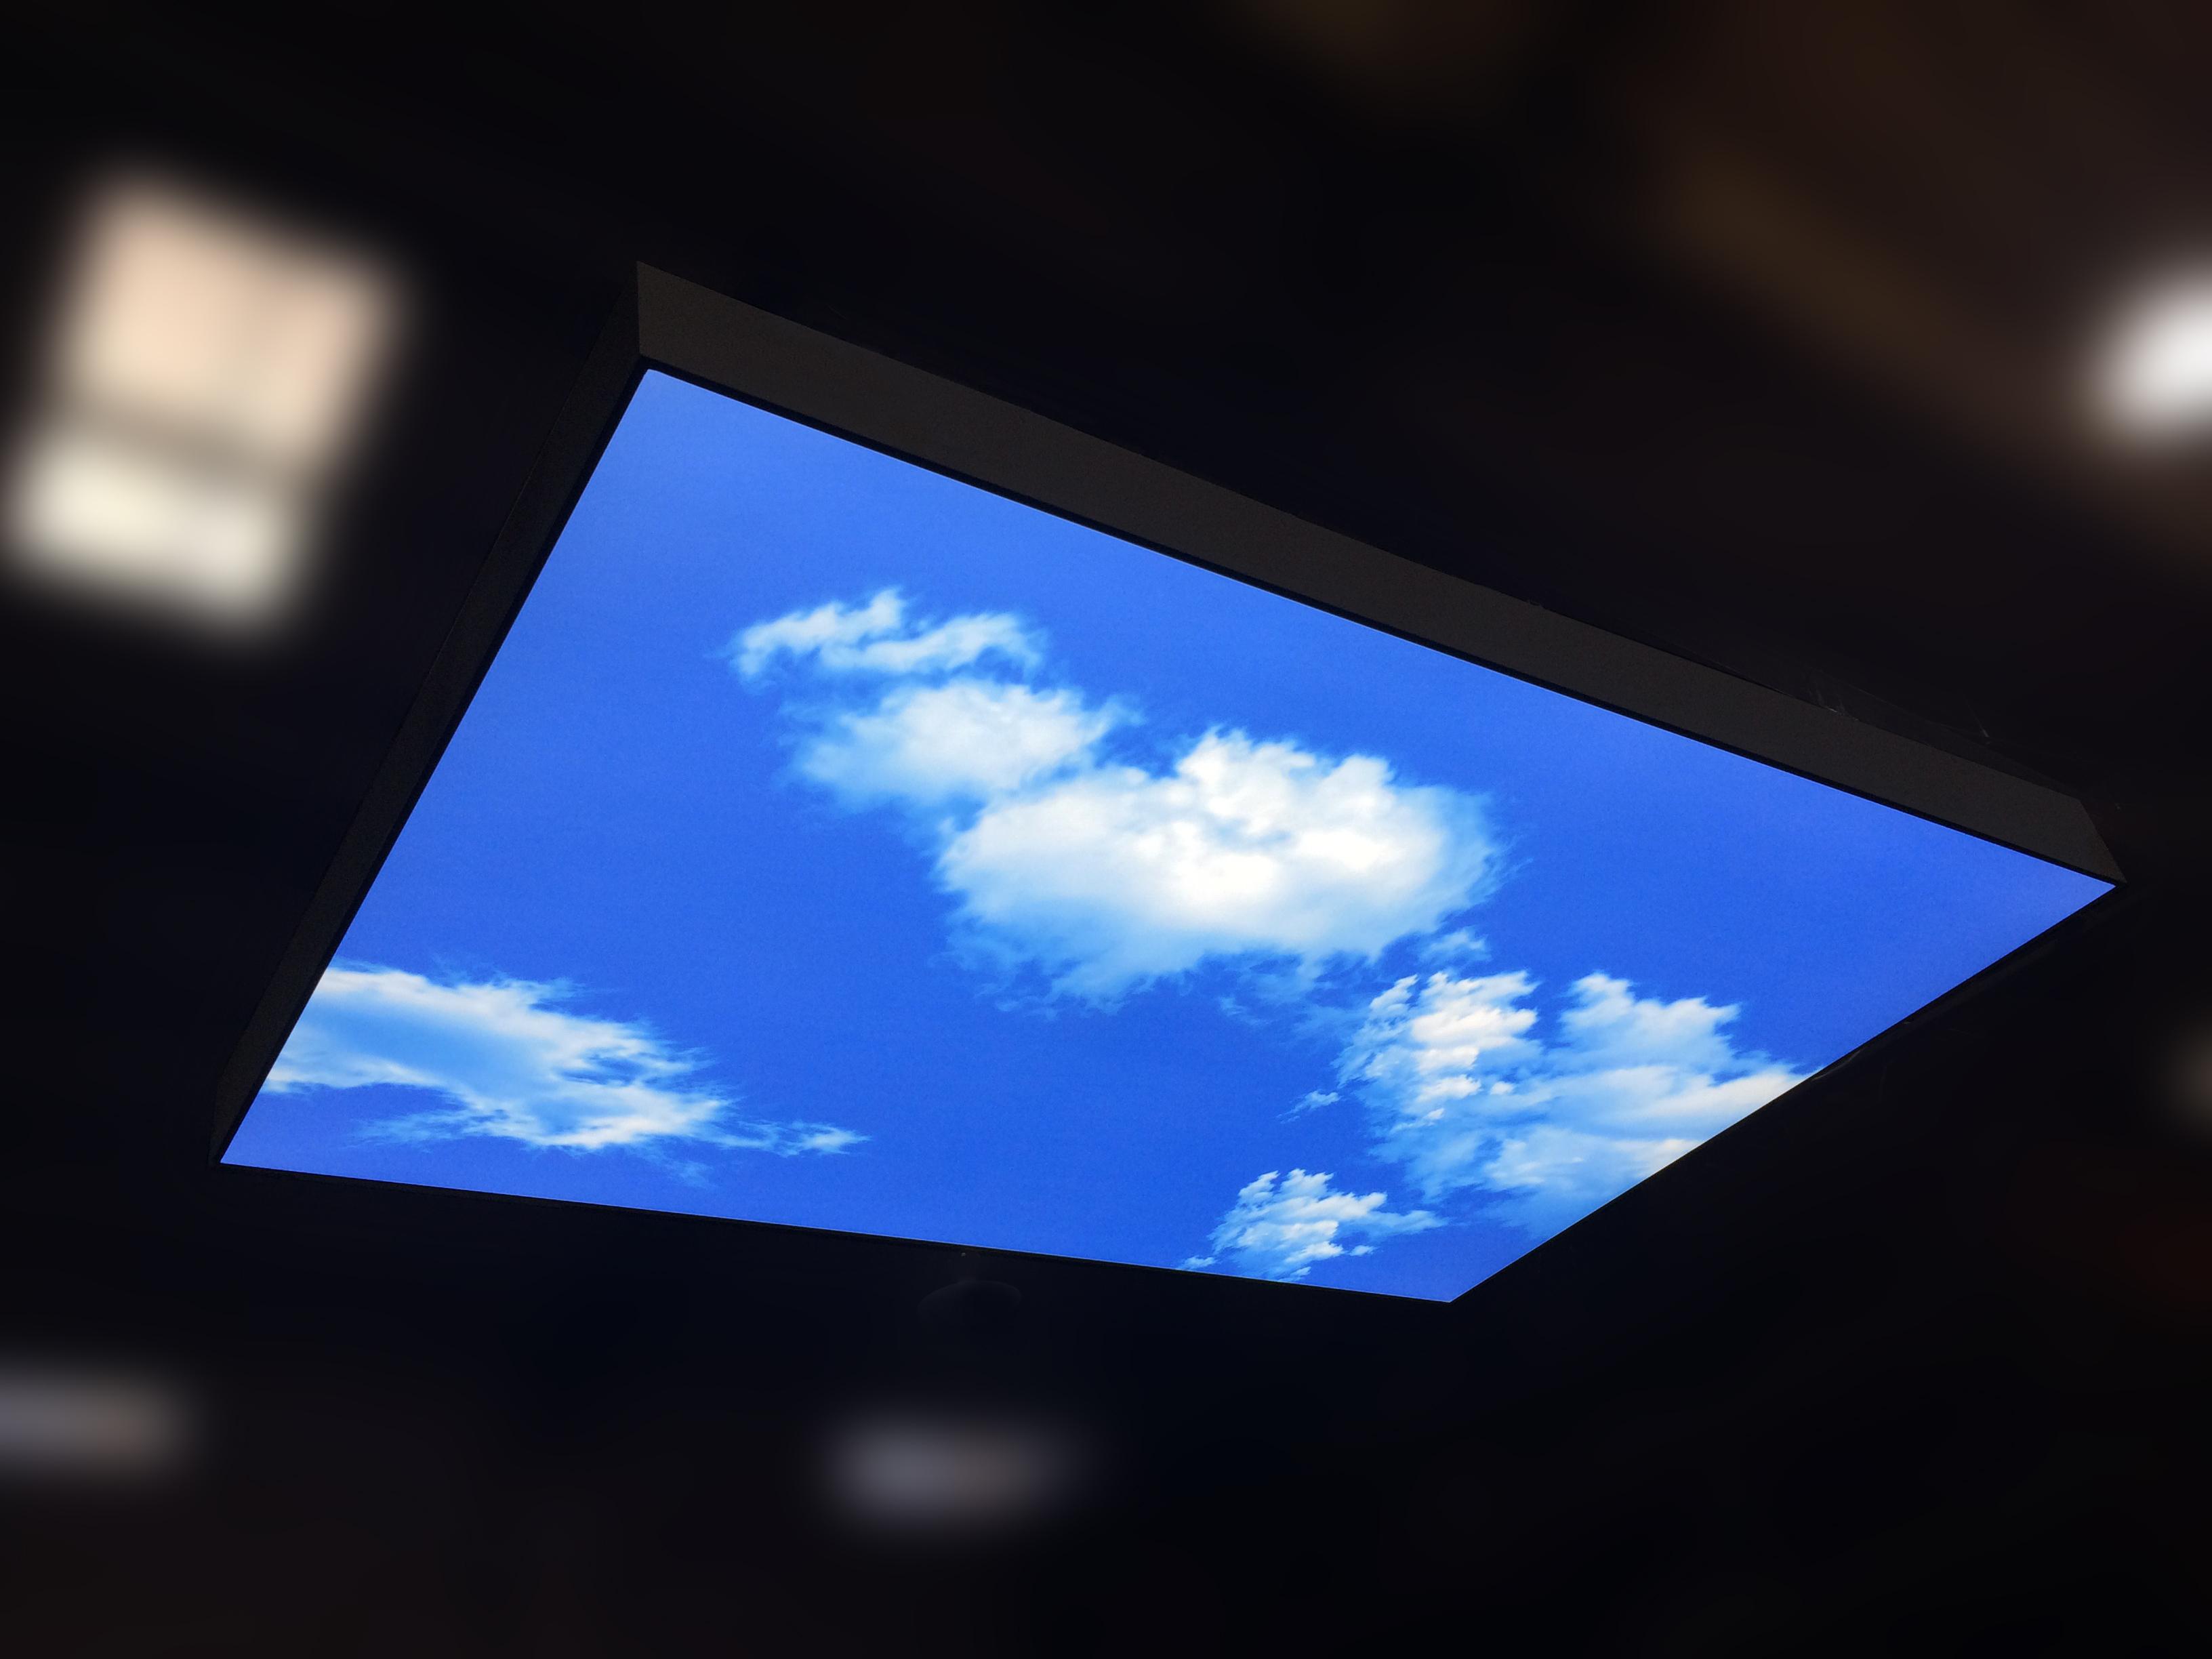 Static Sky light_neonny_stretch film_1.2x1.8m